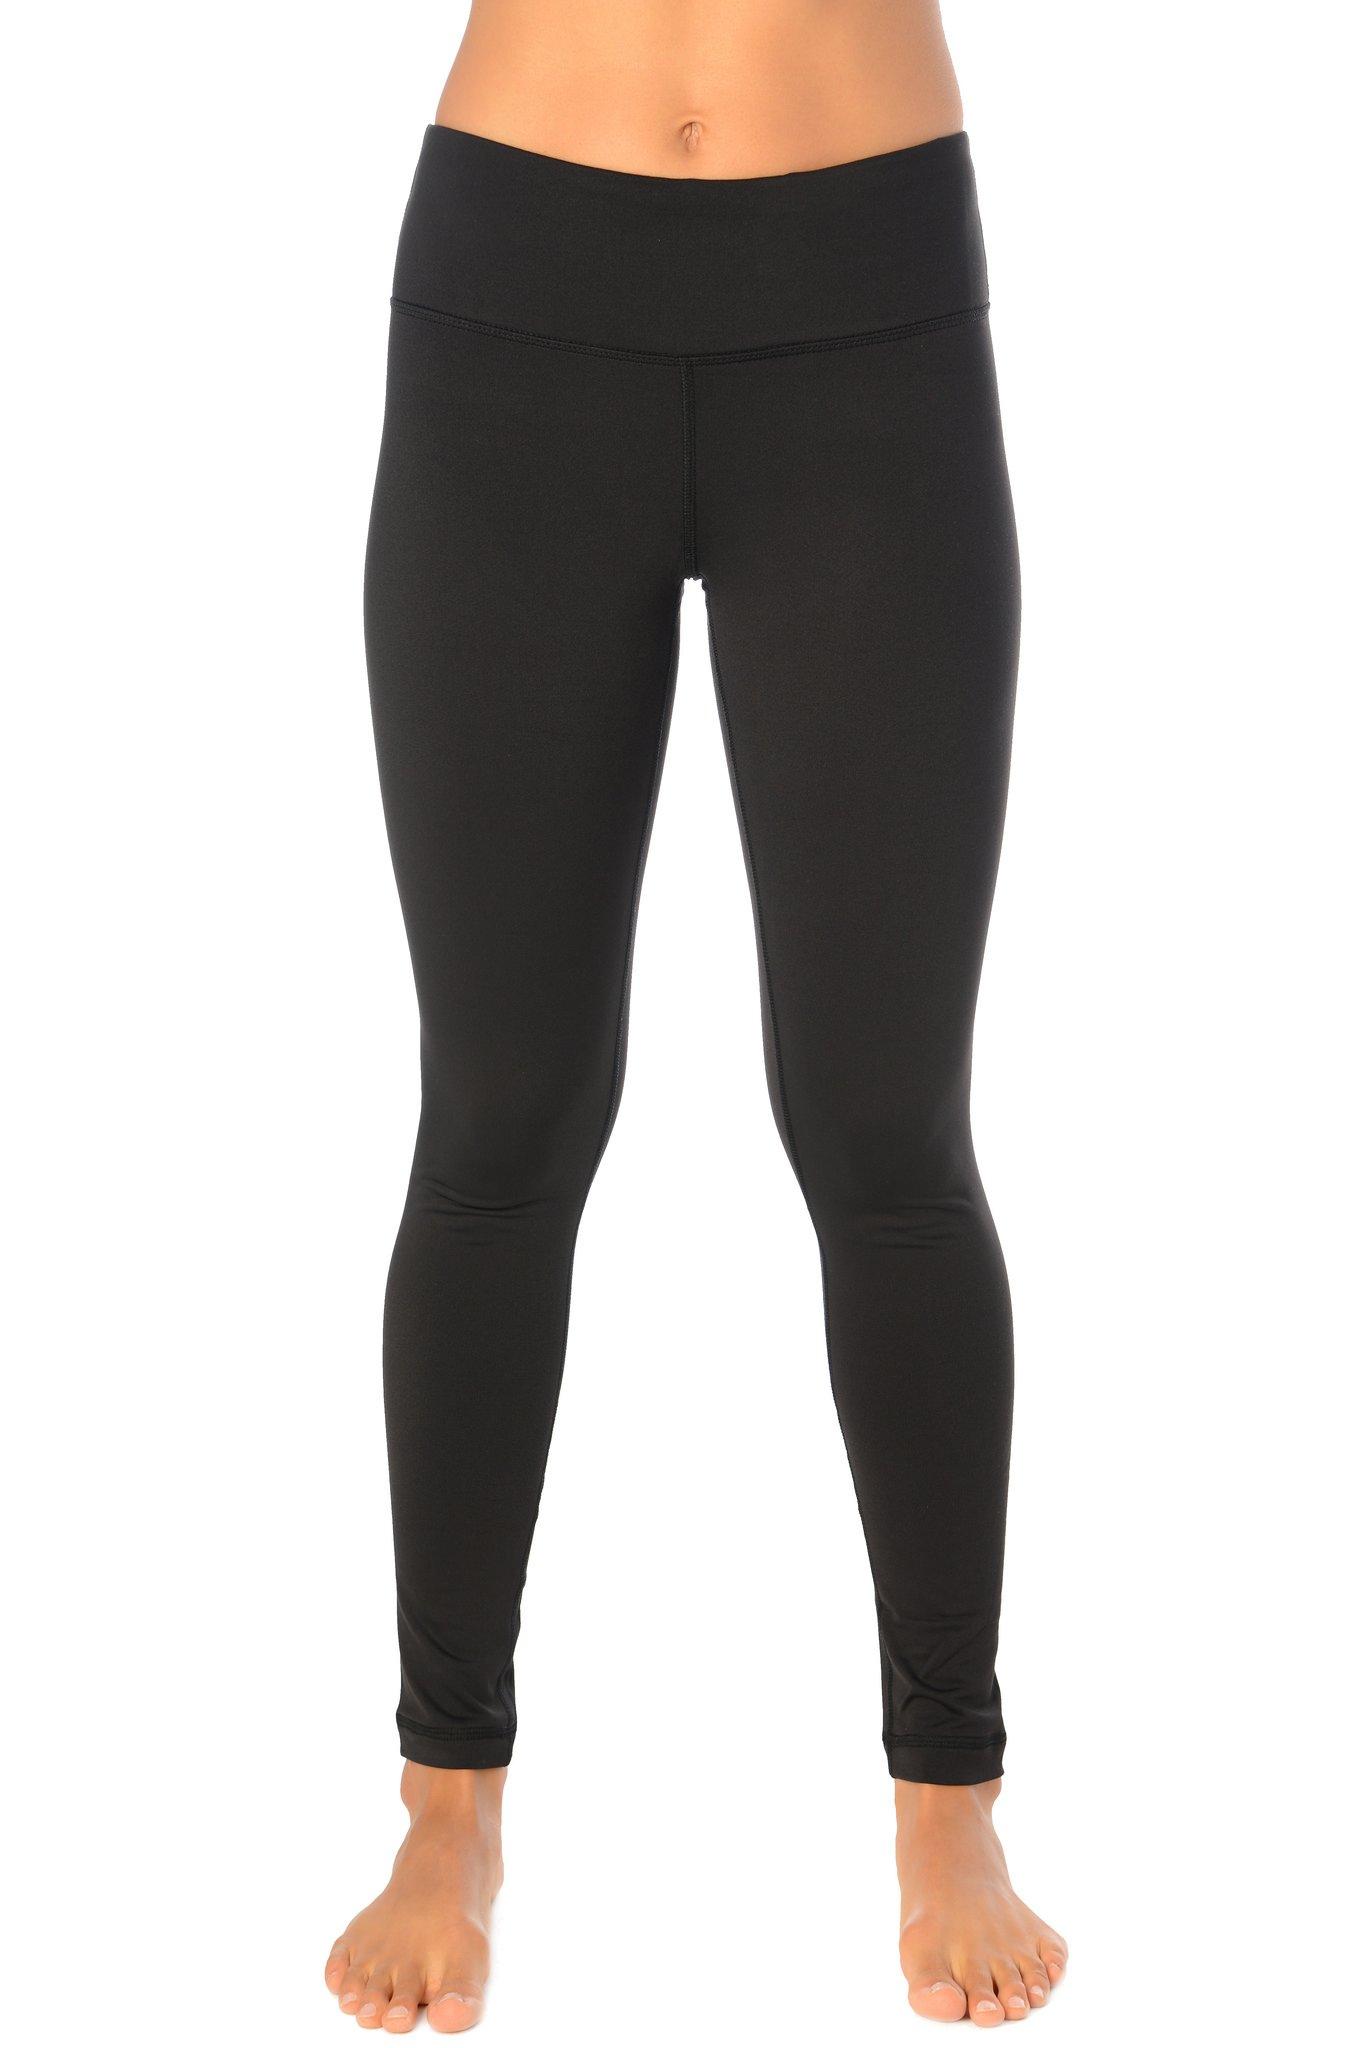 402039b5df4a6 Get Quotations · 90 Degree By Reflex Fleece Lined Leggings - Yoga Pants